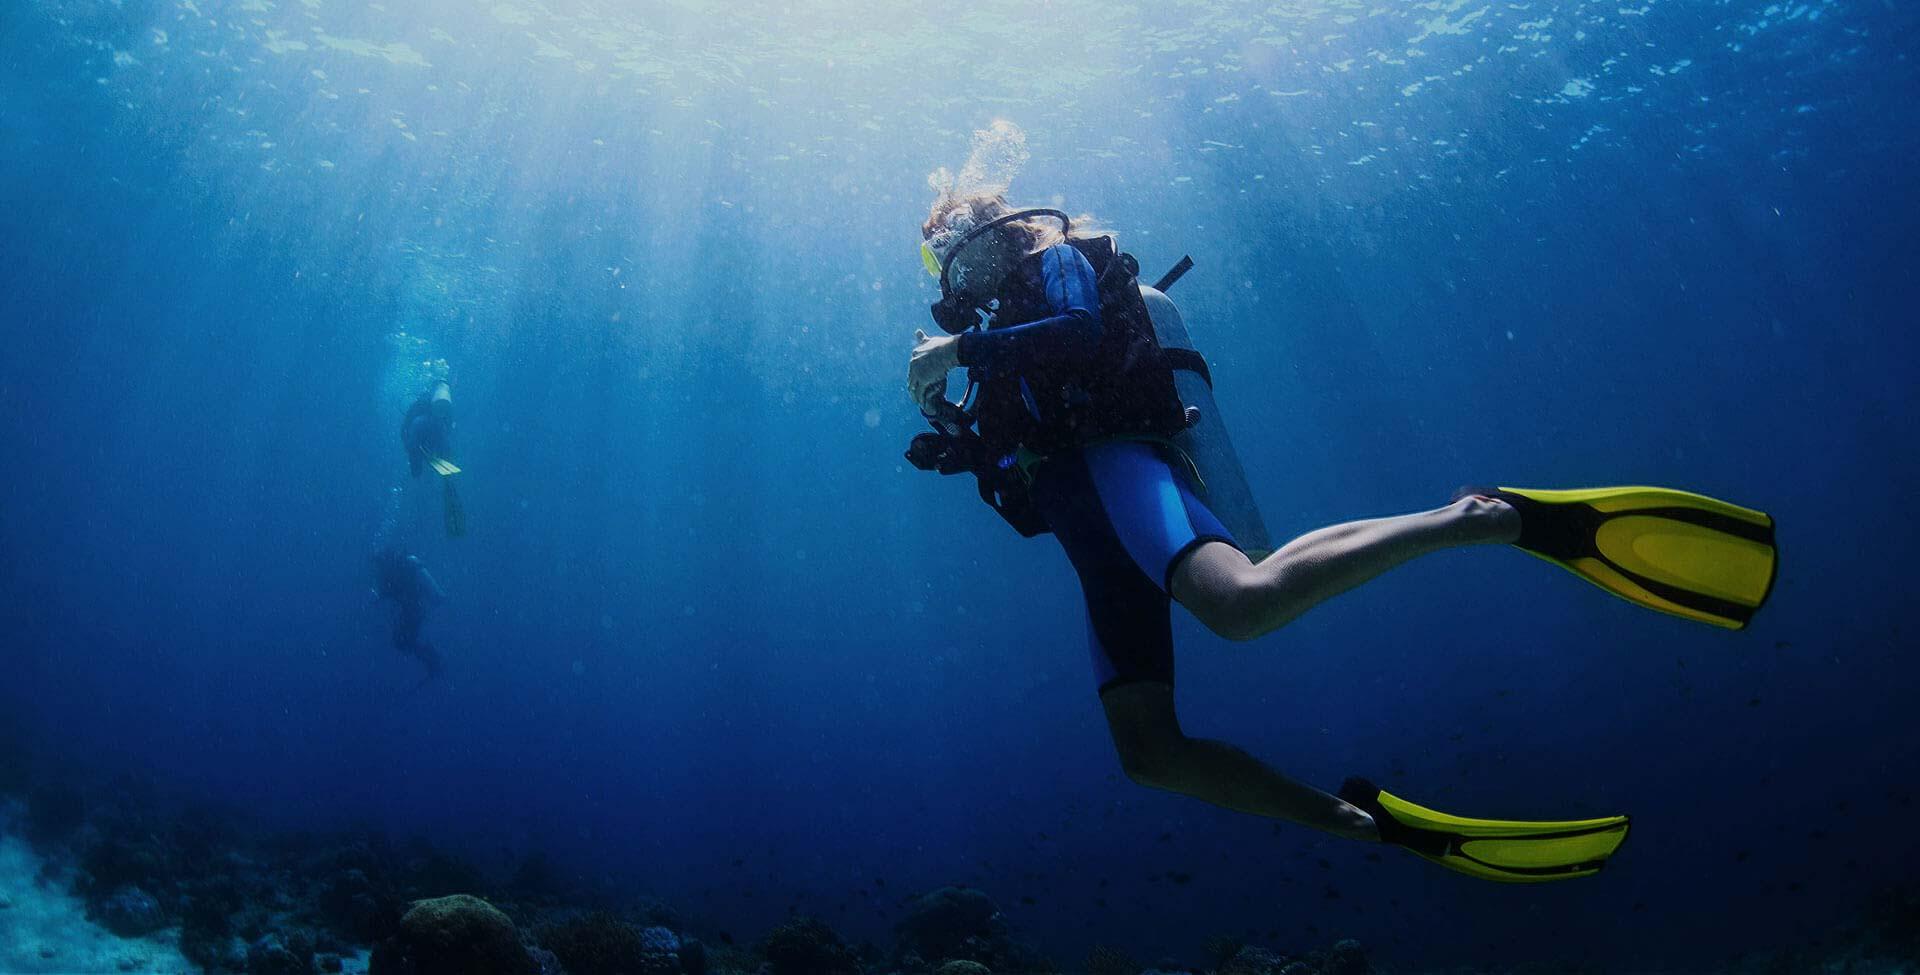 Life looks better underwater.